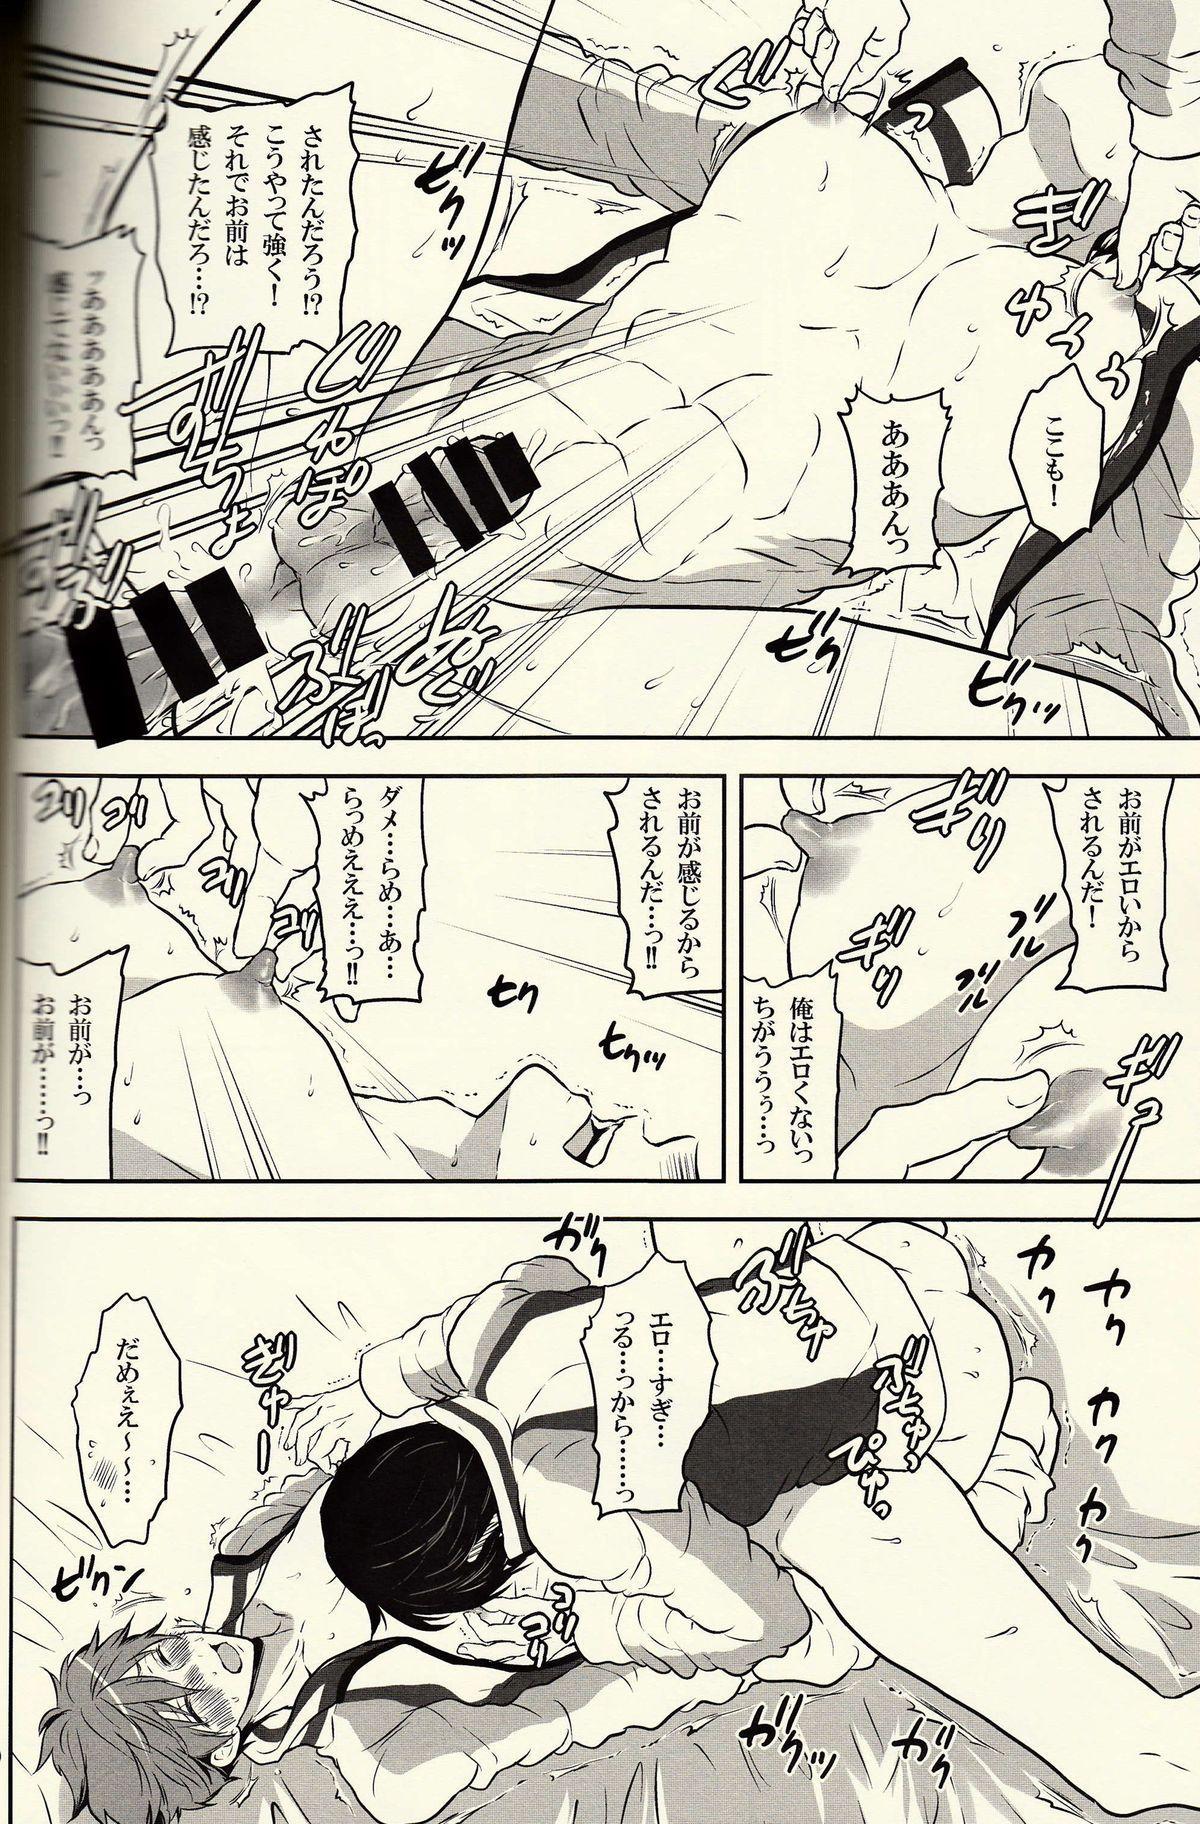 Danshi Hensachi 70 Medley Relay 18